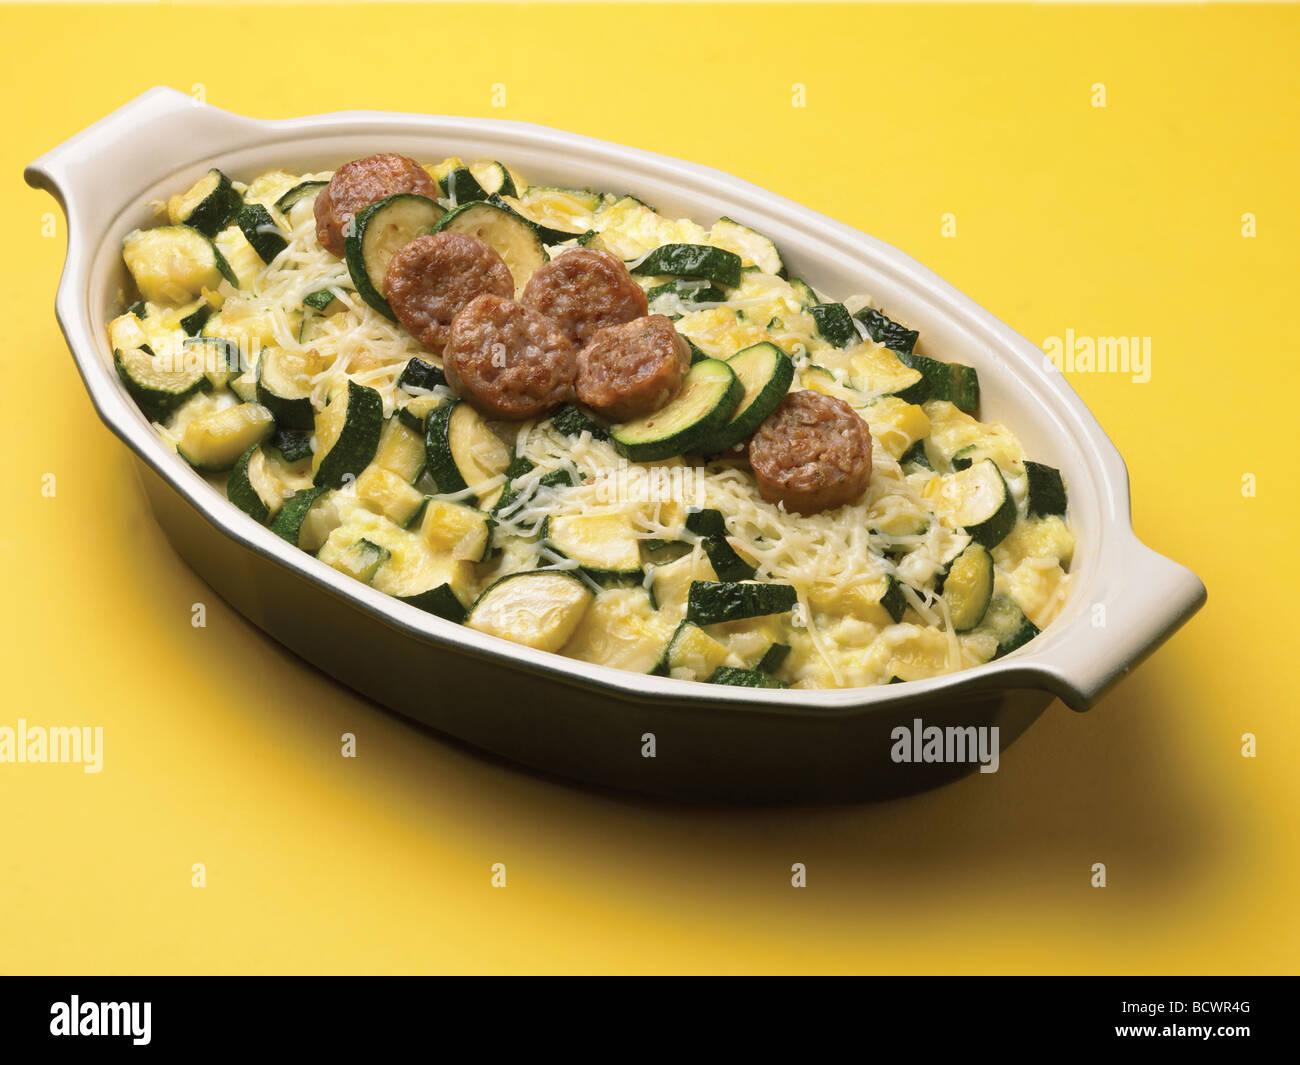 Country Kitchen Recipes Zucchini Sausage Bake Casserole